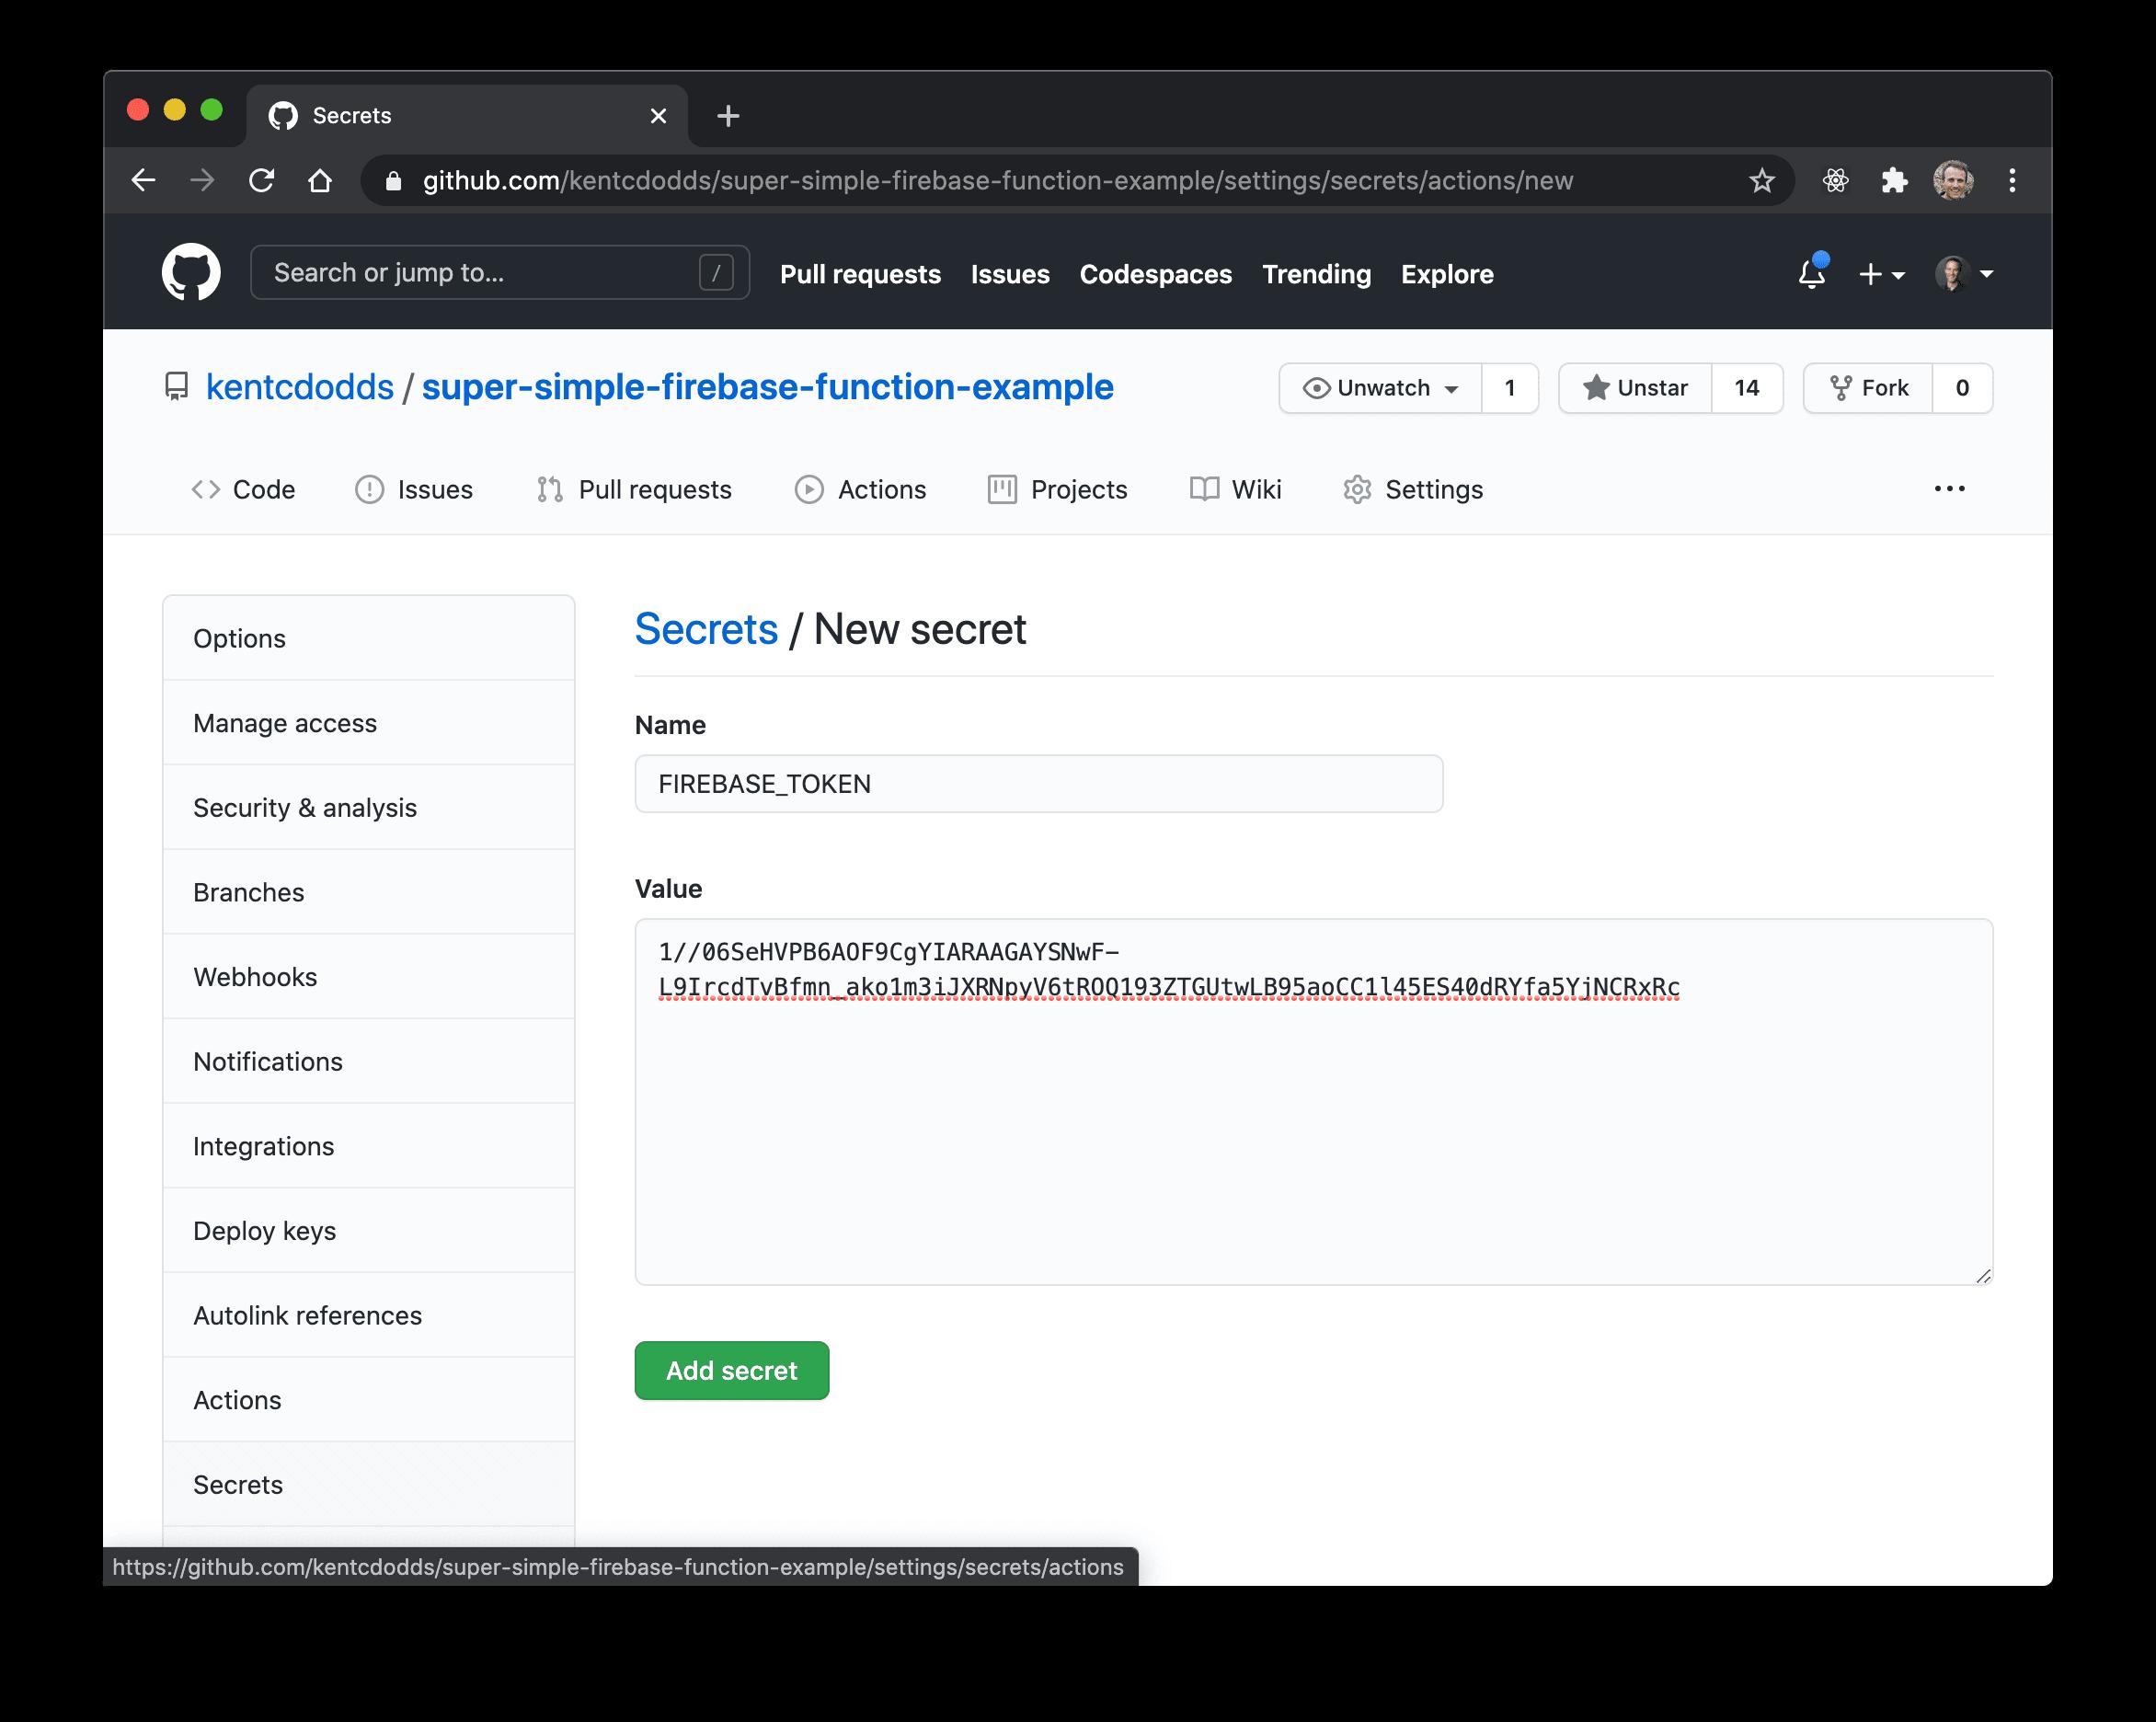 GitHub secrets UI adding the firebase token